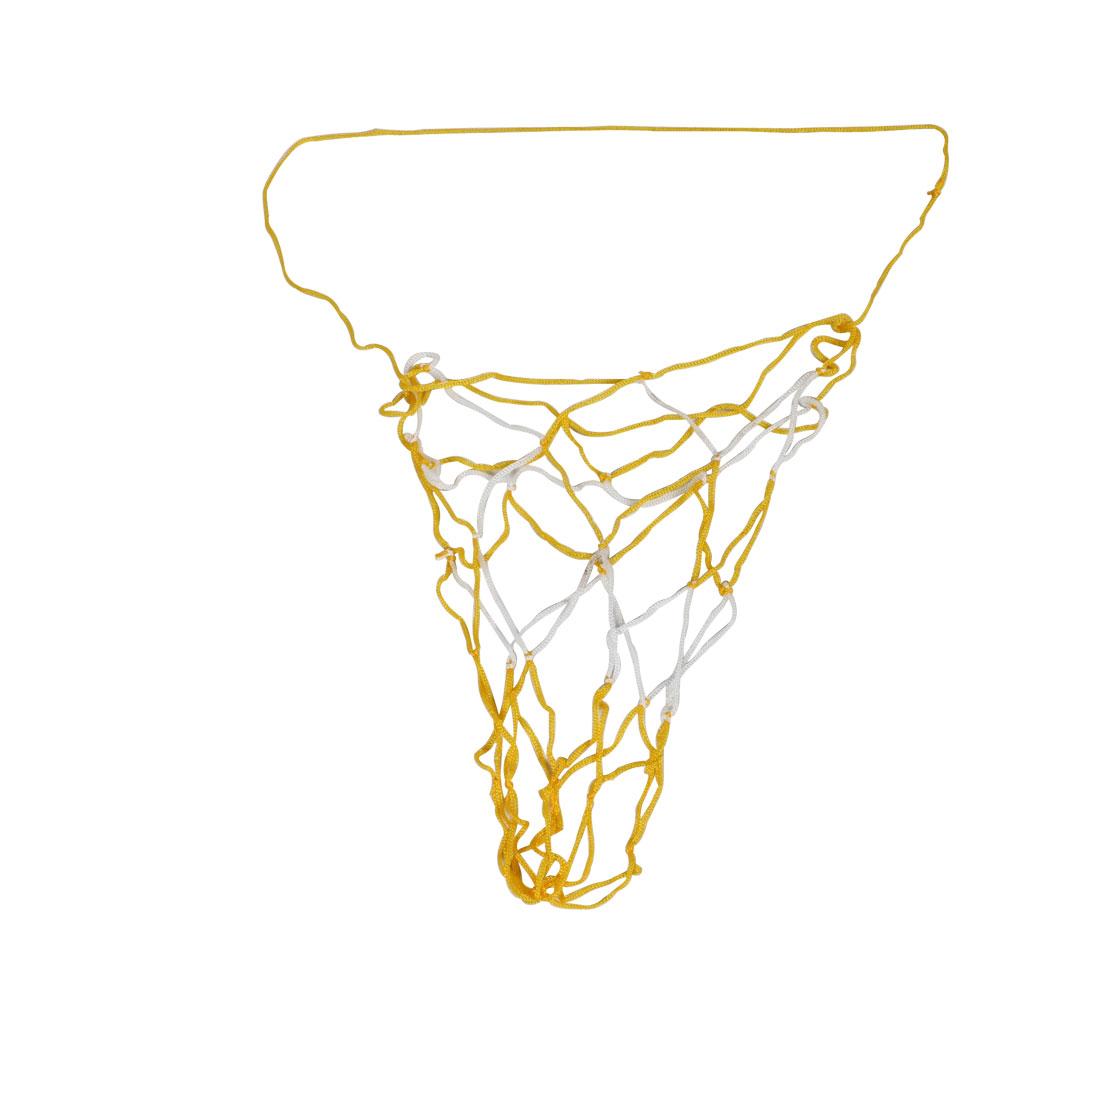 "35.4"" Length Yellow White Nylon Basketball Football Carry Net Bag 2 Pcs"